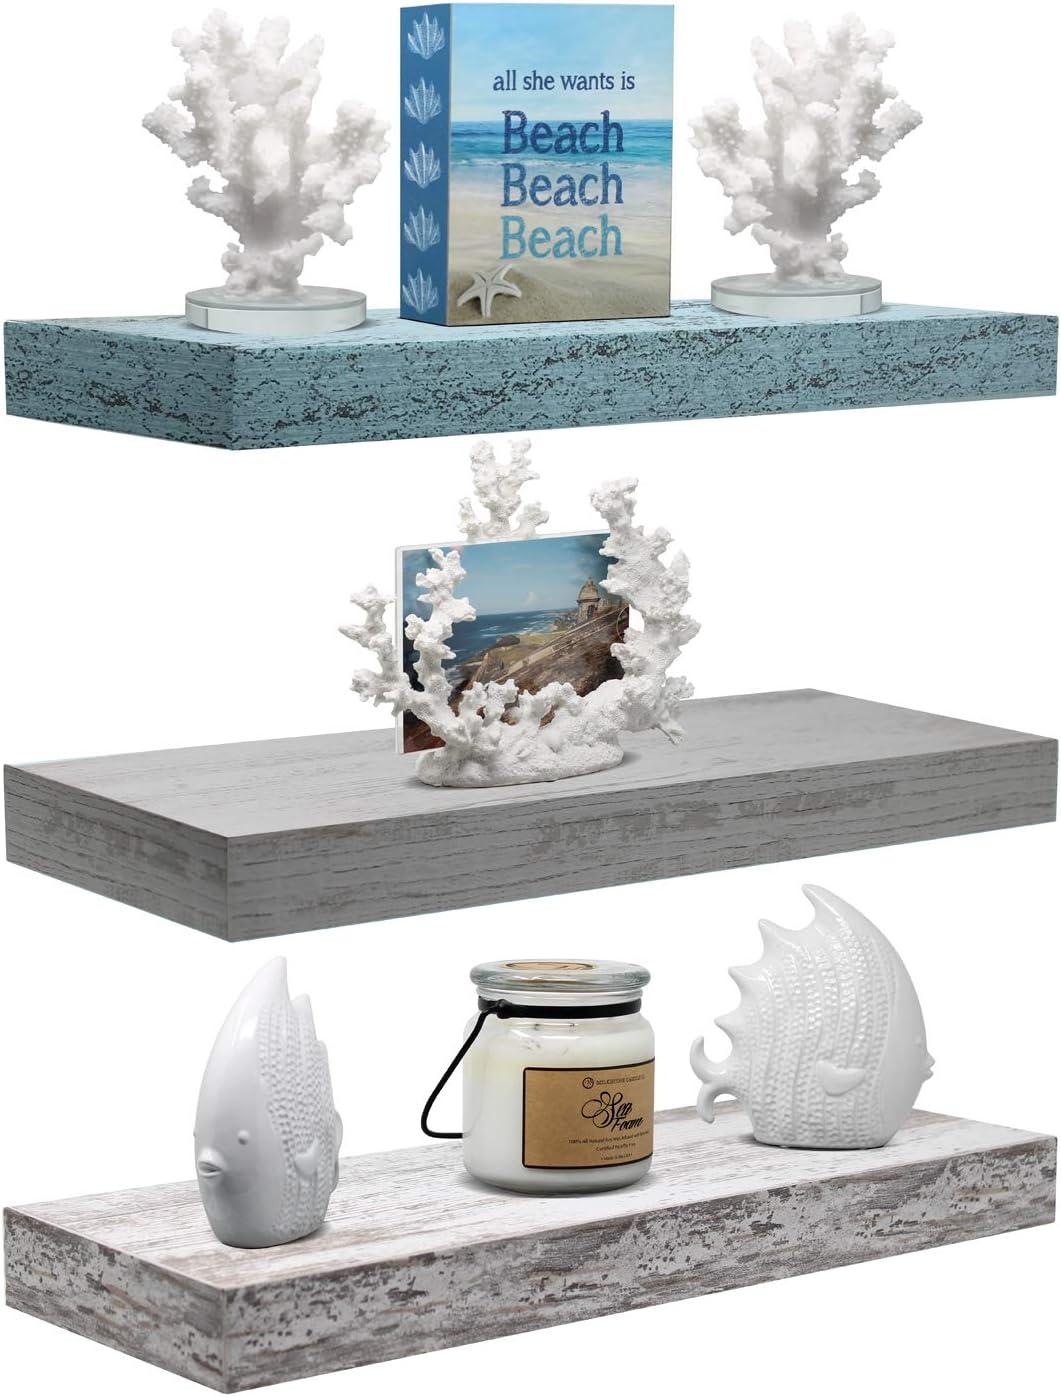 Sorbus Floating Shelf Set — Rustic Wood Coastal Beach Style Hanging Rectangle Wall Shelves for Home Décor, Trophy Display, Photo Frames, etc (3-Pack, Rectangle Shelf Set -Green White Grey)